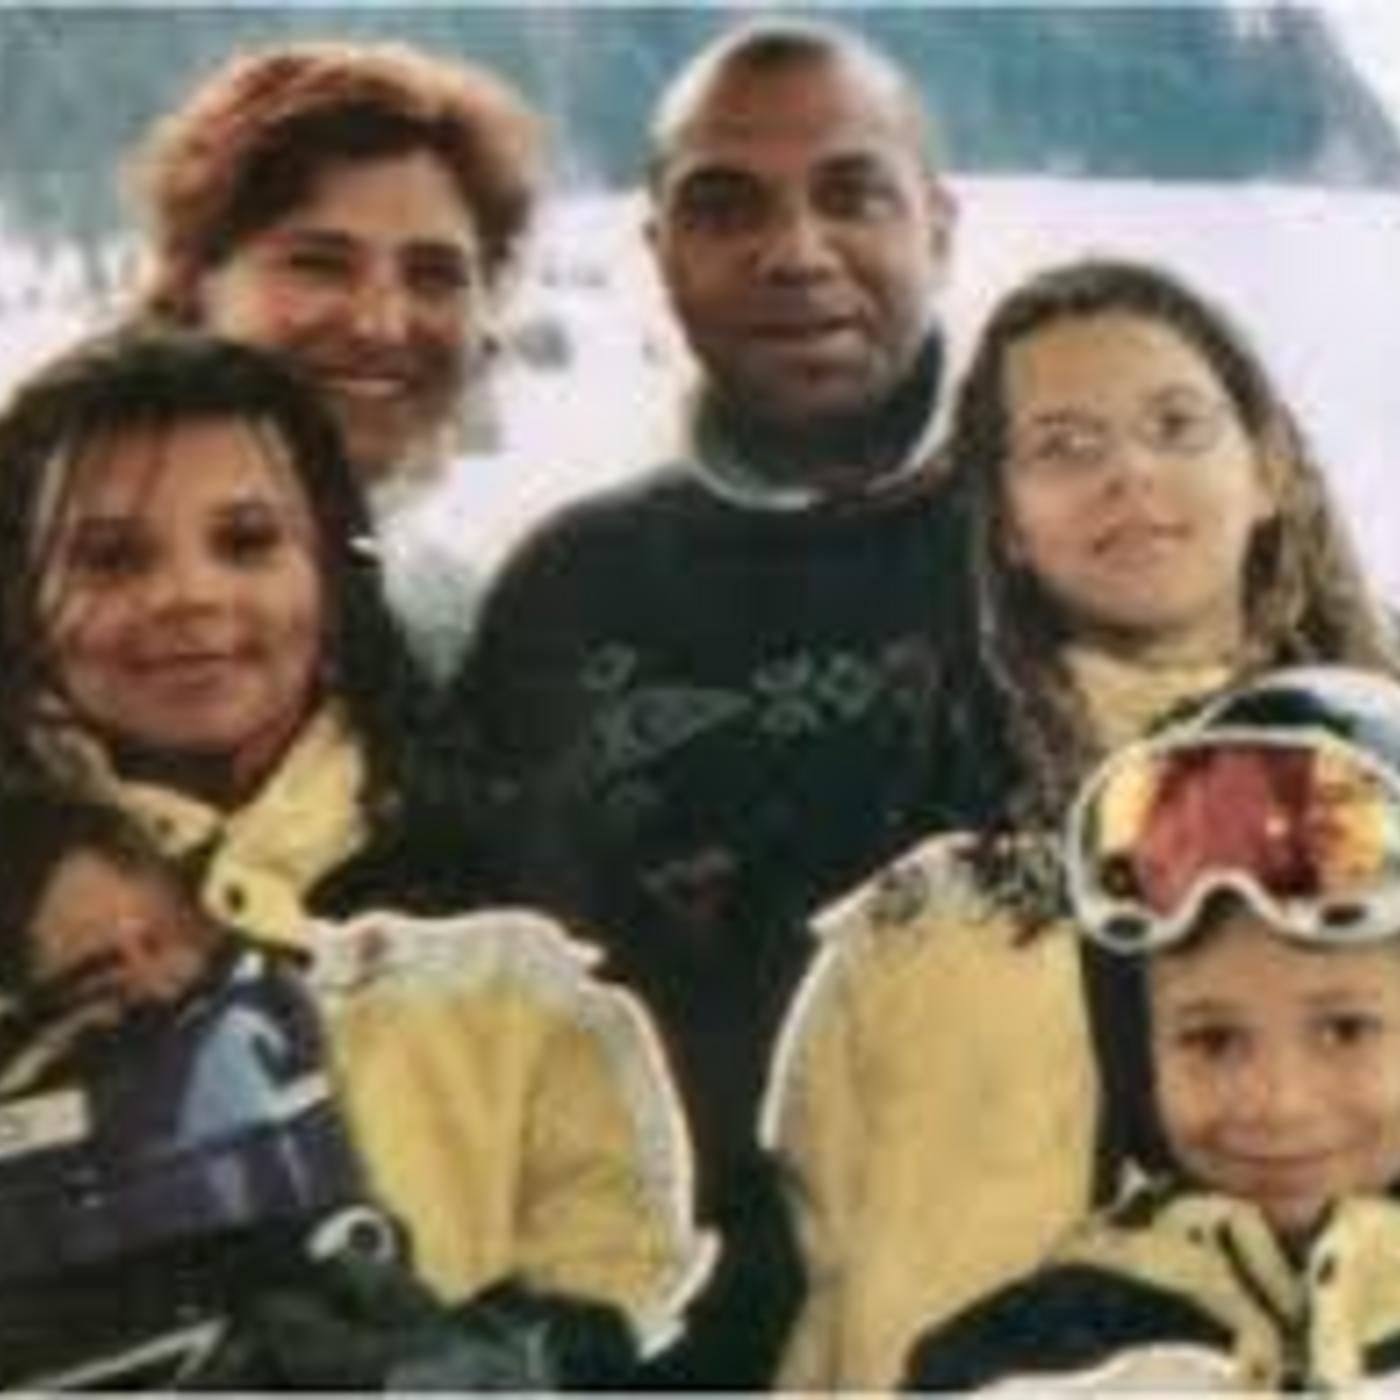 52: Xavier Flactif, Graziella Ortolano ja lapset Sarah, Laetitia ja Gregory